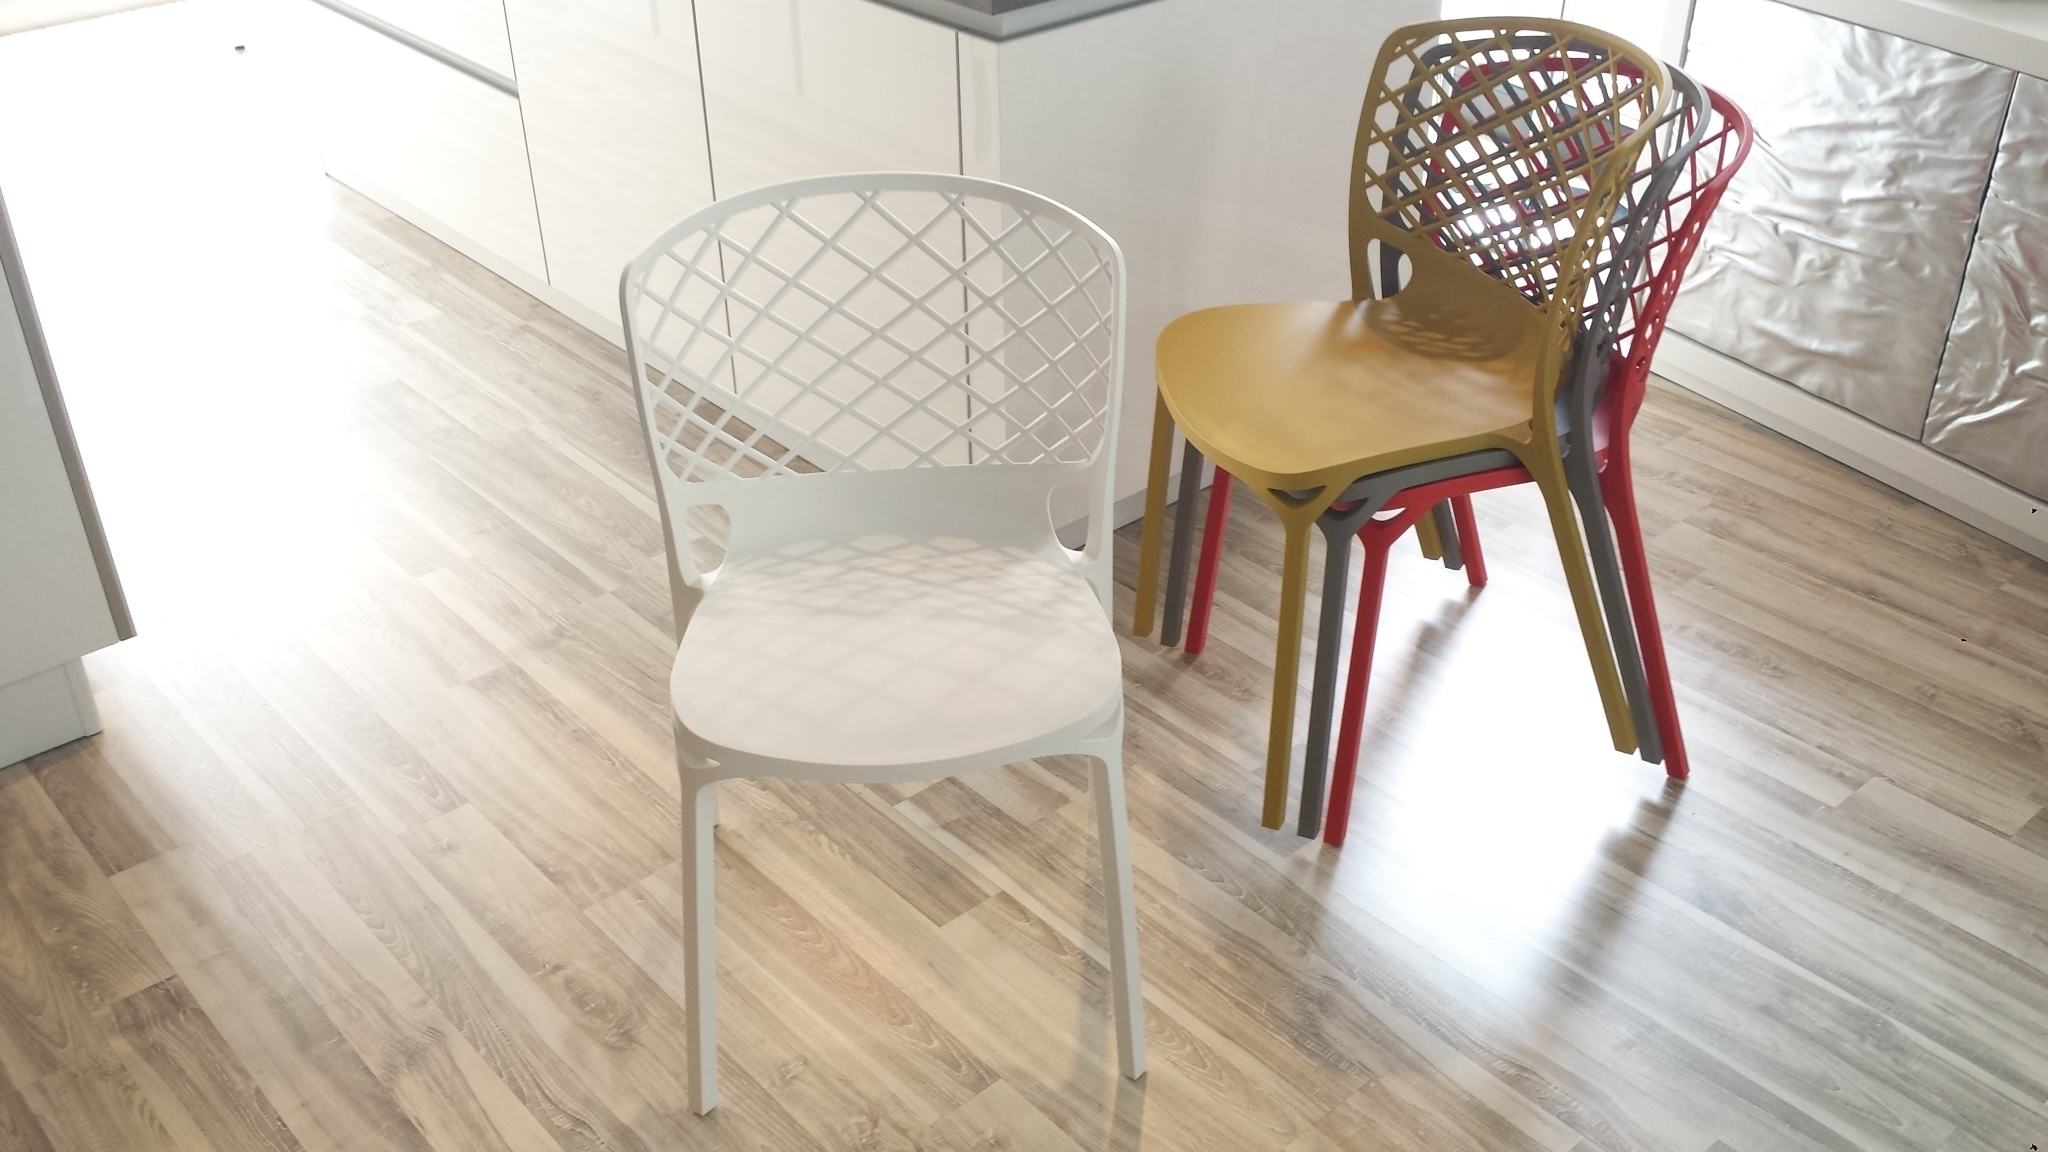 Sedia calligaris mod gamera sedie a prezzi scontati for Sedie e tavoli calligaris prezzi